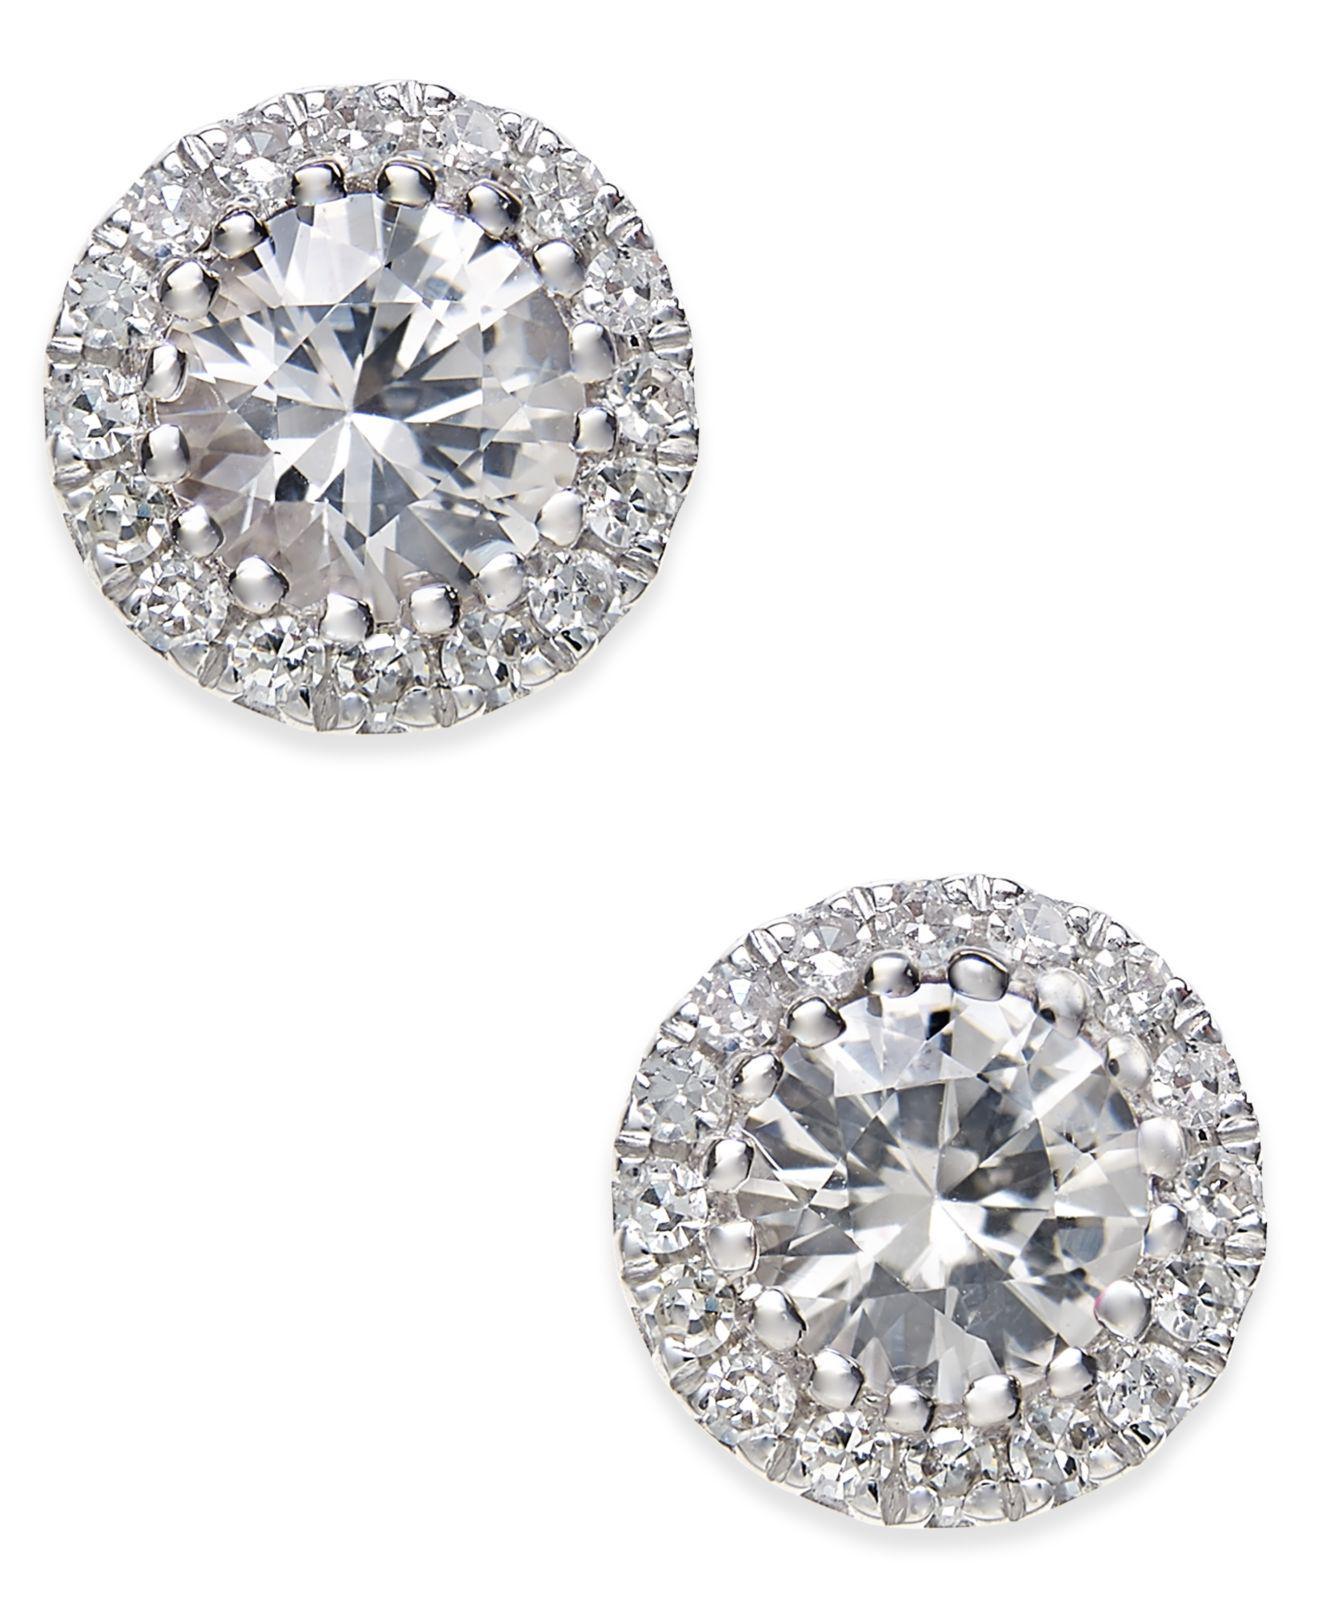 71d385680 Macy's White Sapphire (5/8 Ct. T.w.) And Diamond (1/10 Ct. T.w. ...